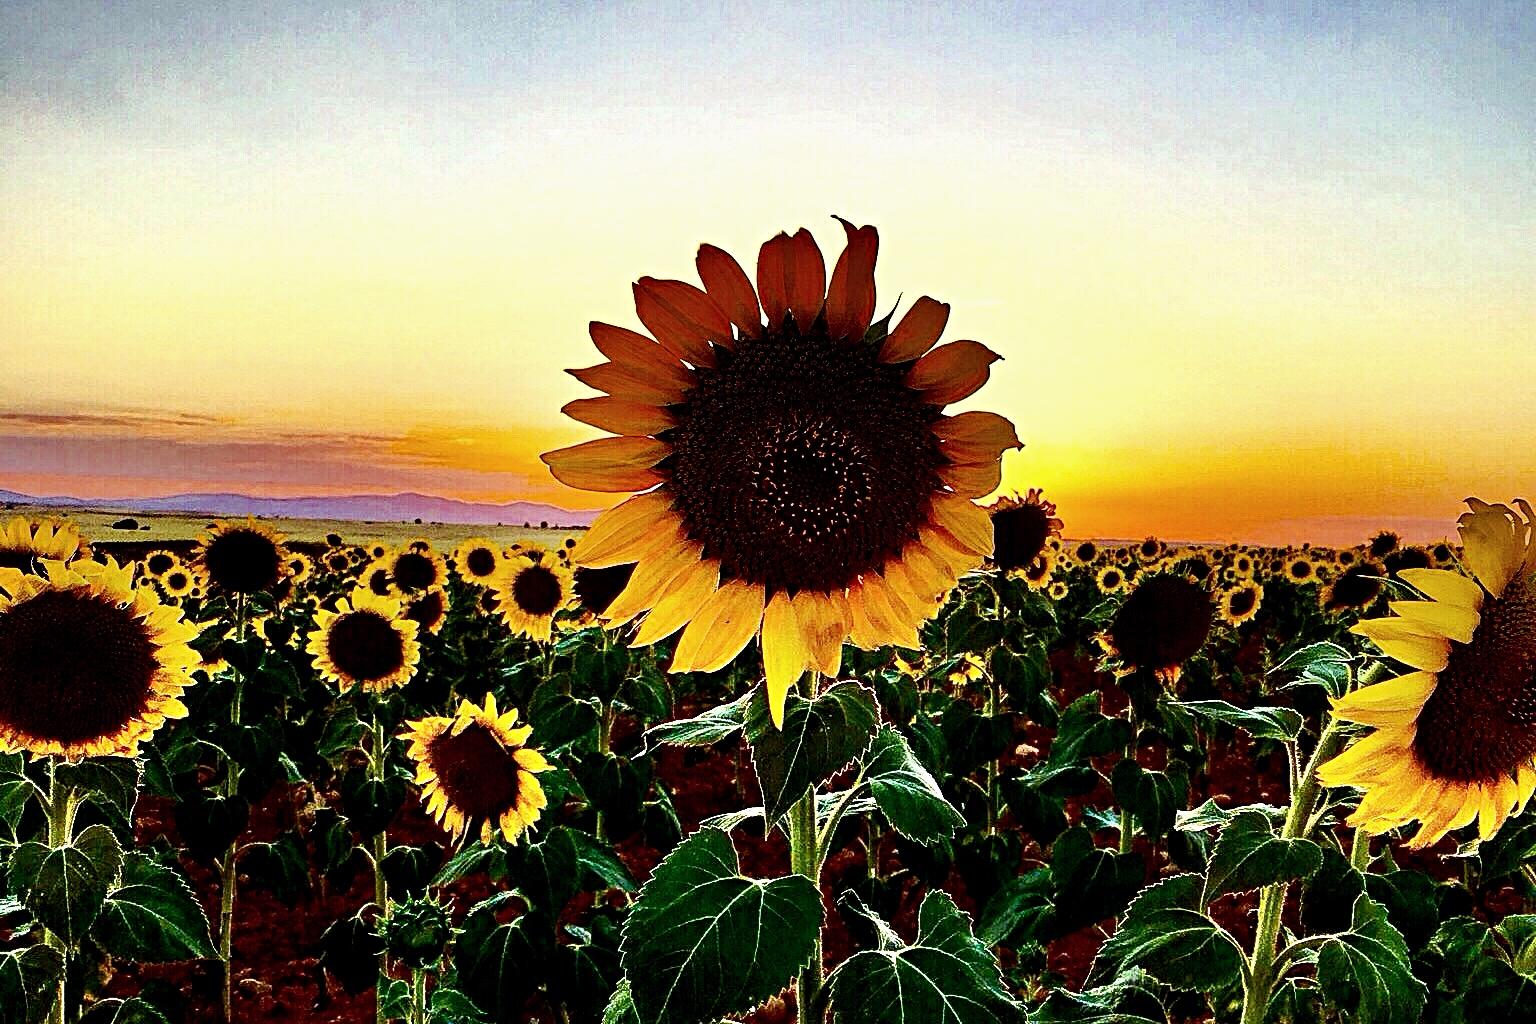 Sunflower Iphone Wallpaper Fondos De Pantalla Puesta De Sol Flores Campo